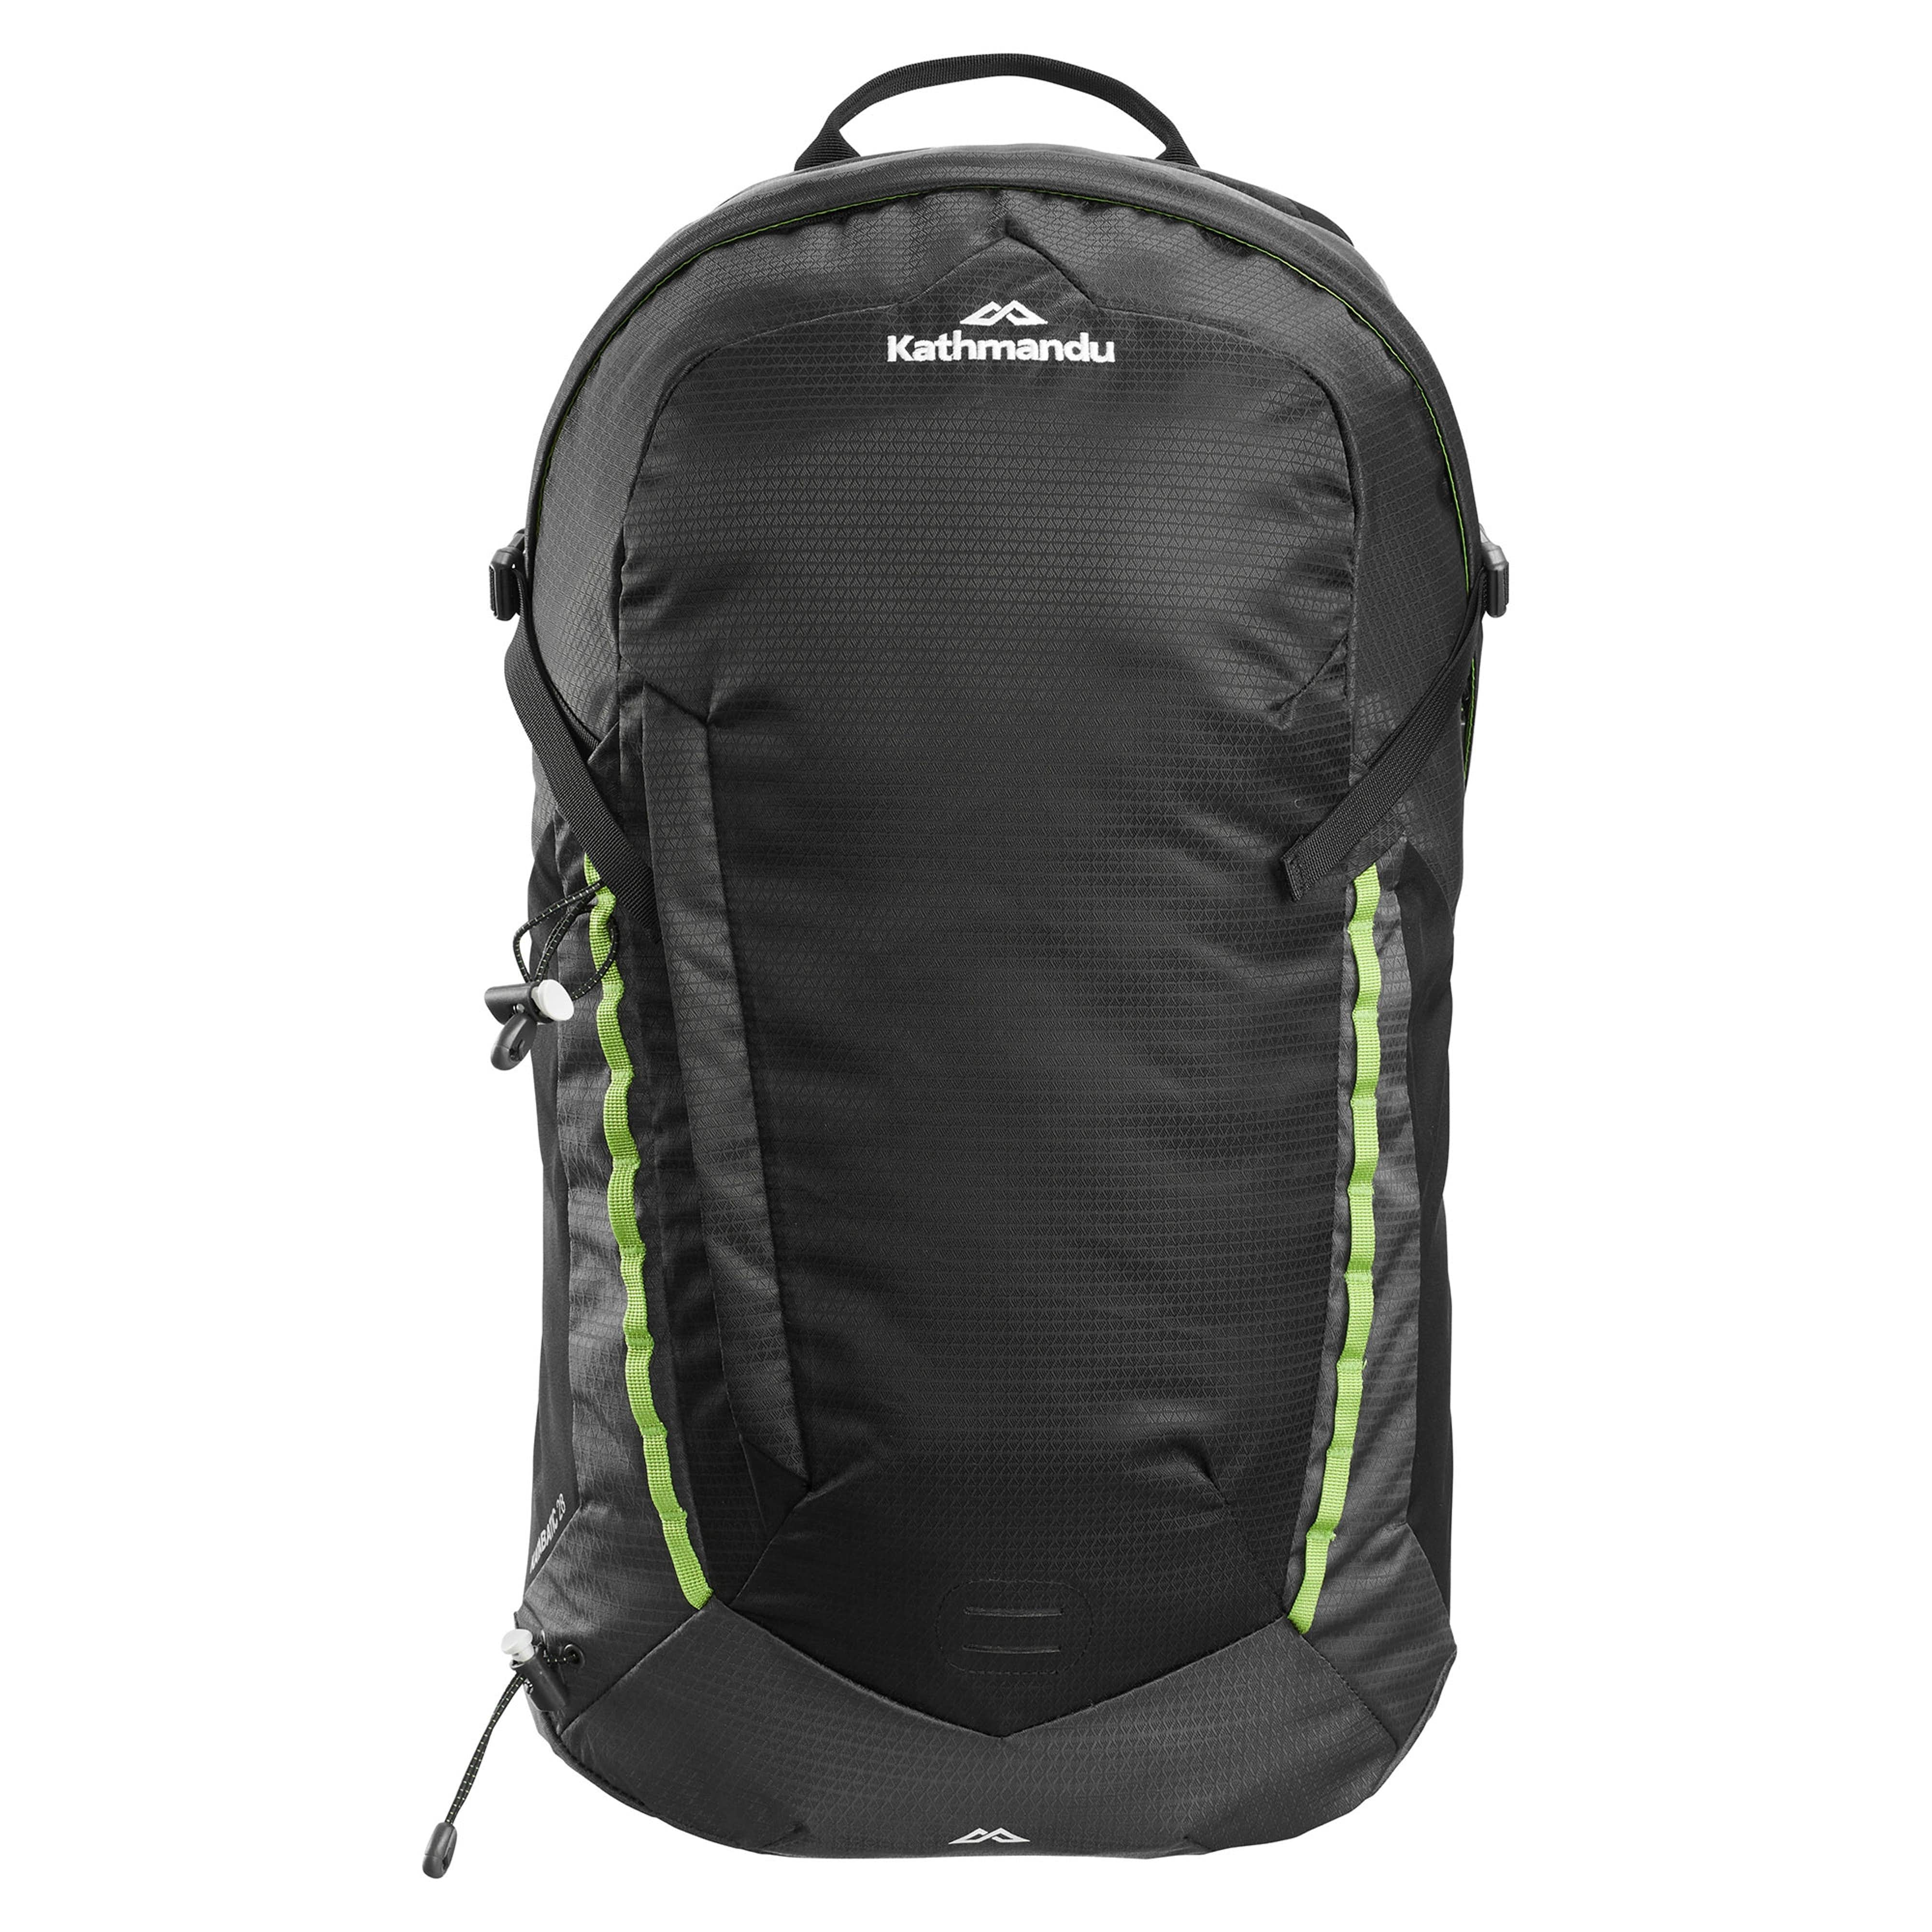 Katabatic 28L Pack 63579b84fad01